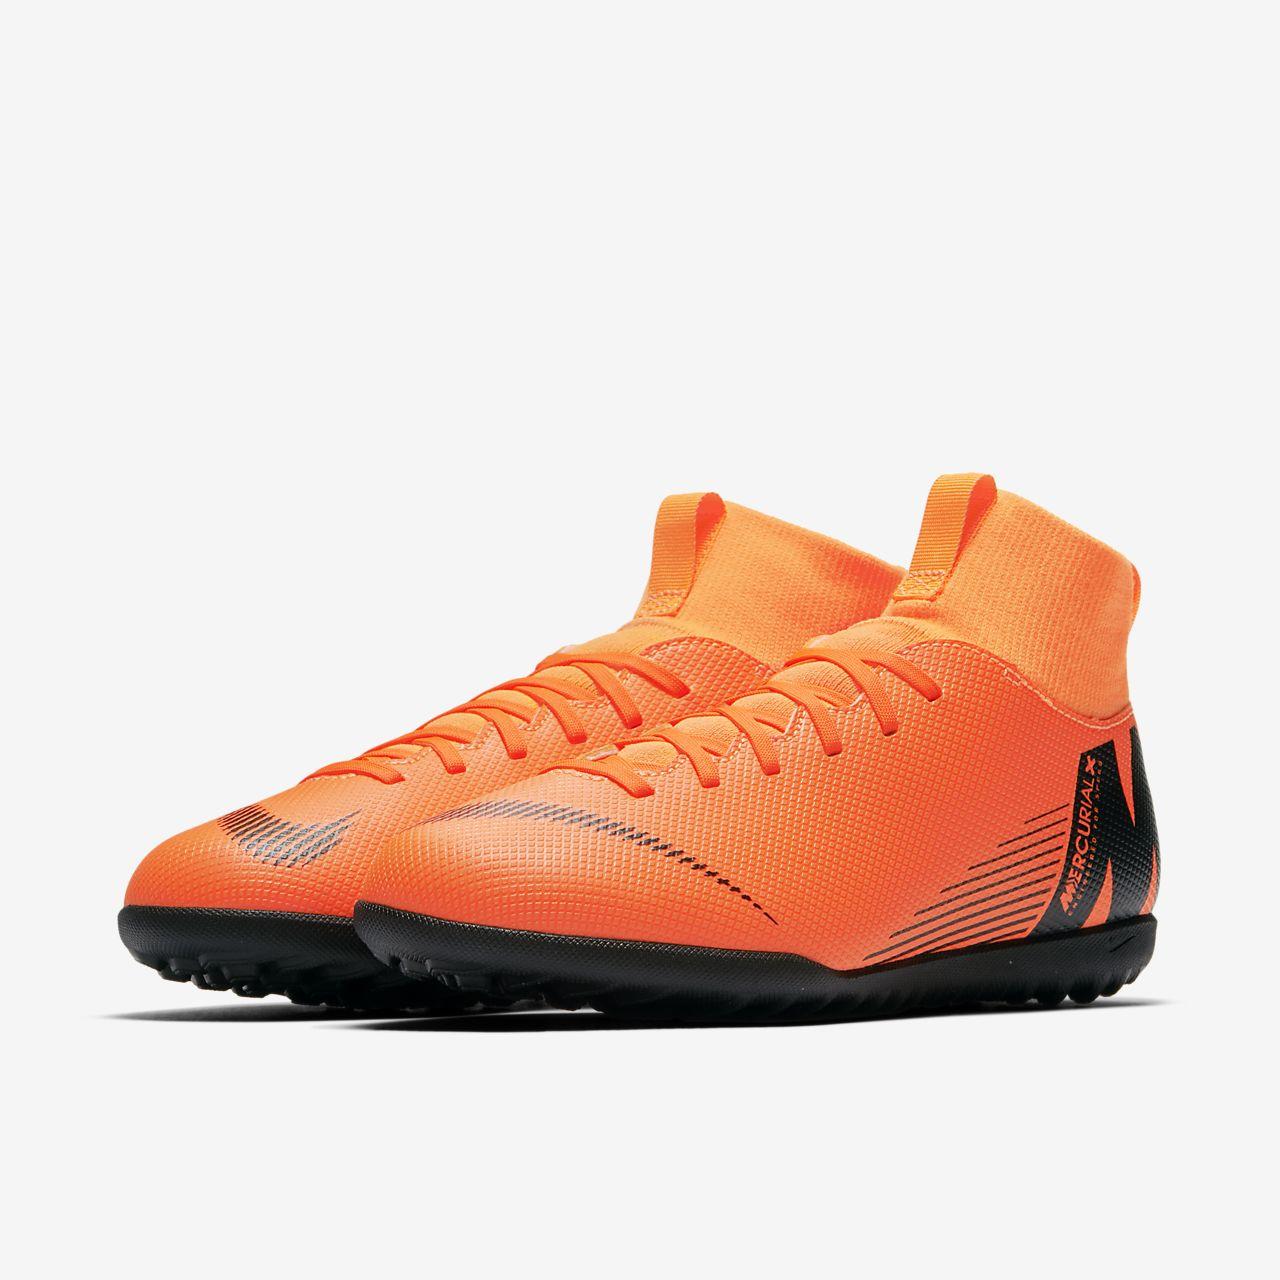 NikeSuperflyX 6 Club TF